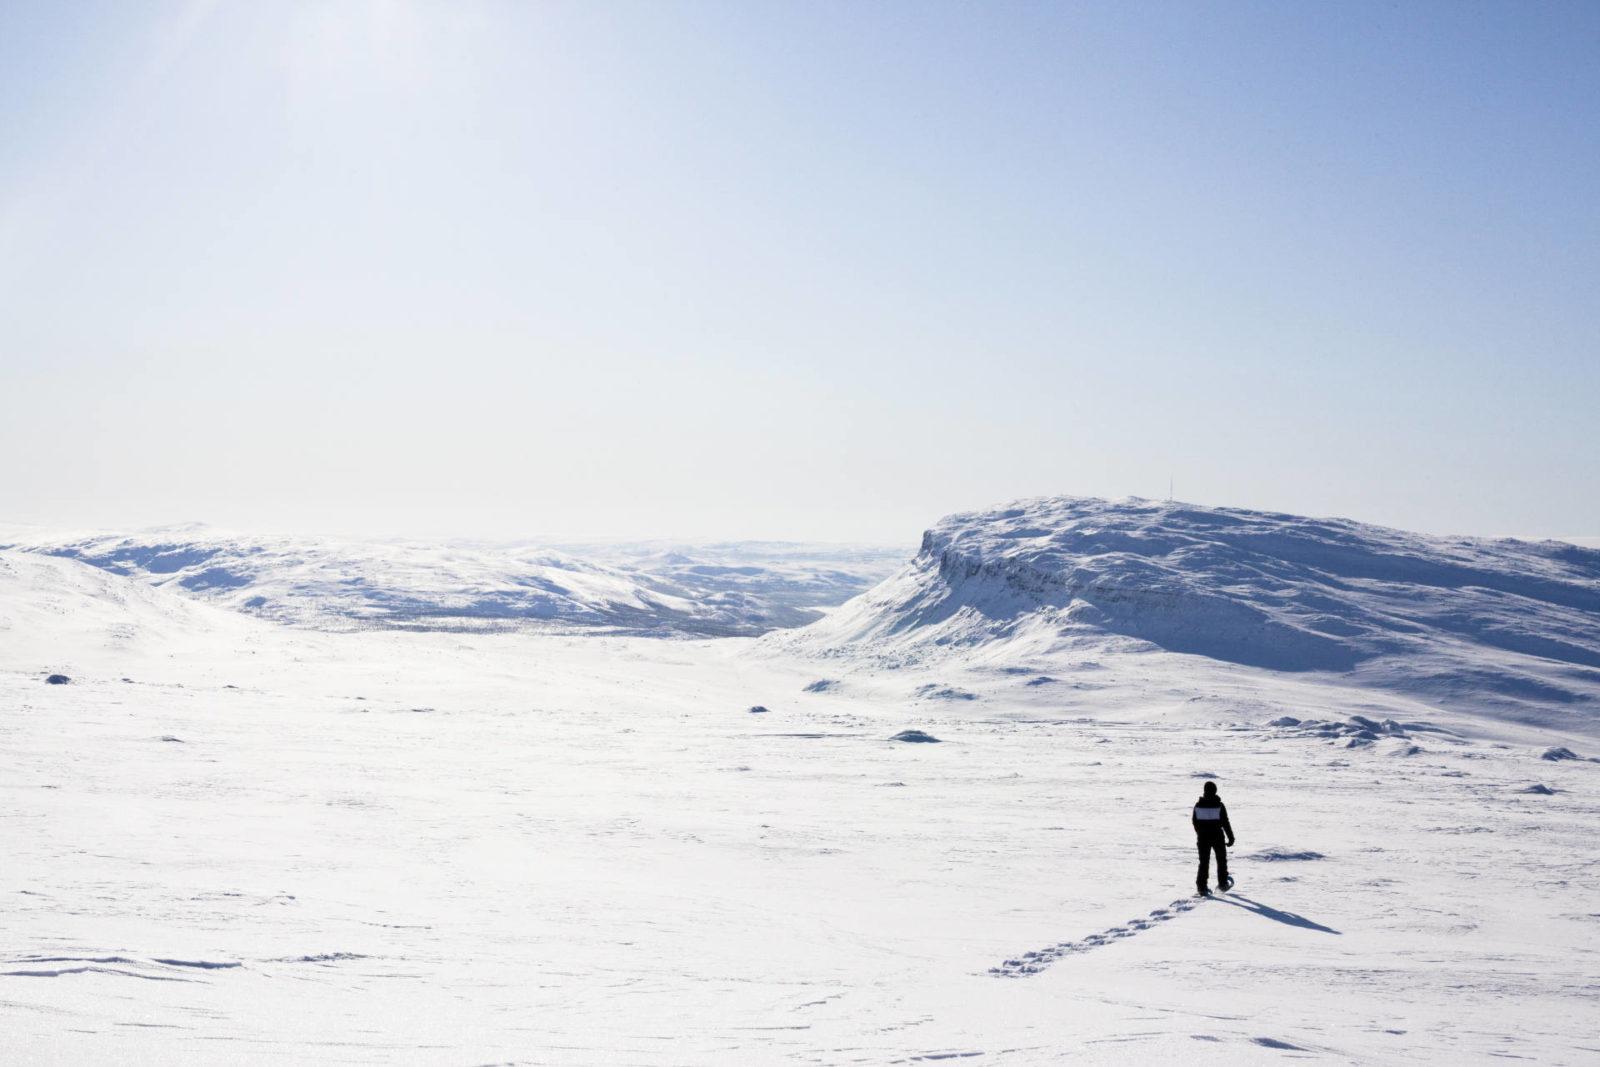 Snowshoeing in Lapland Finland